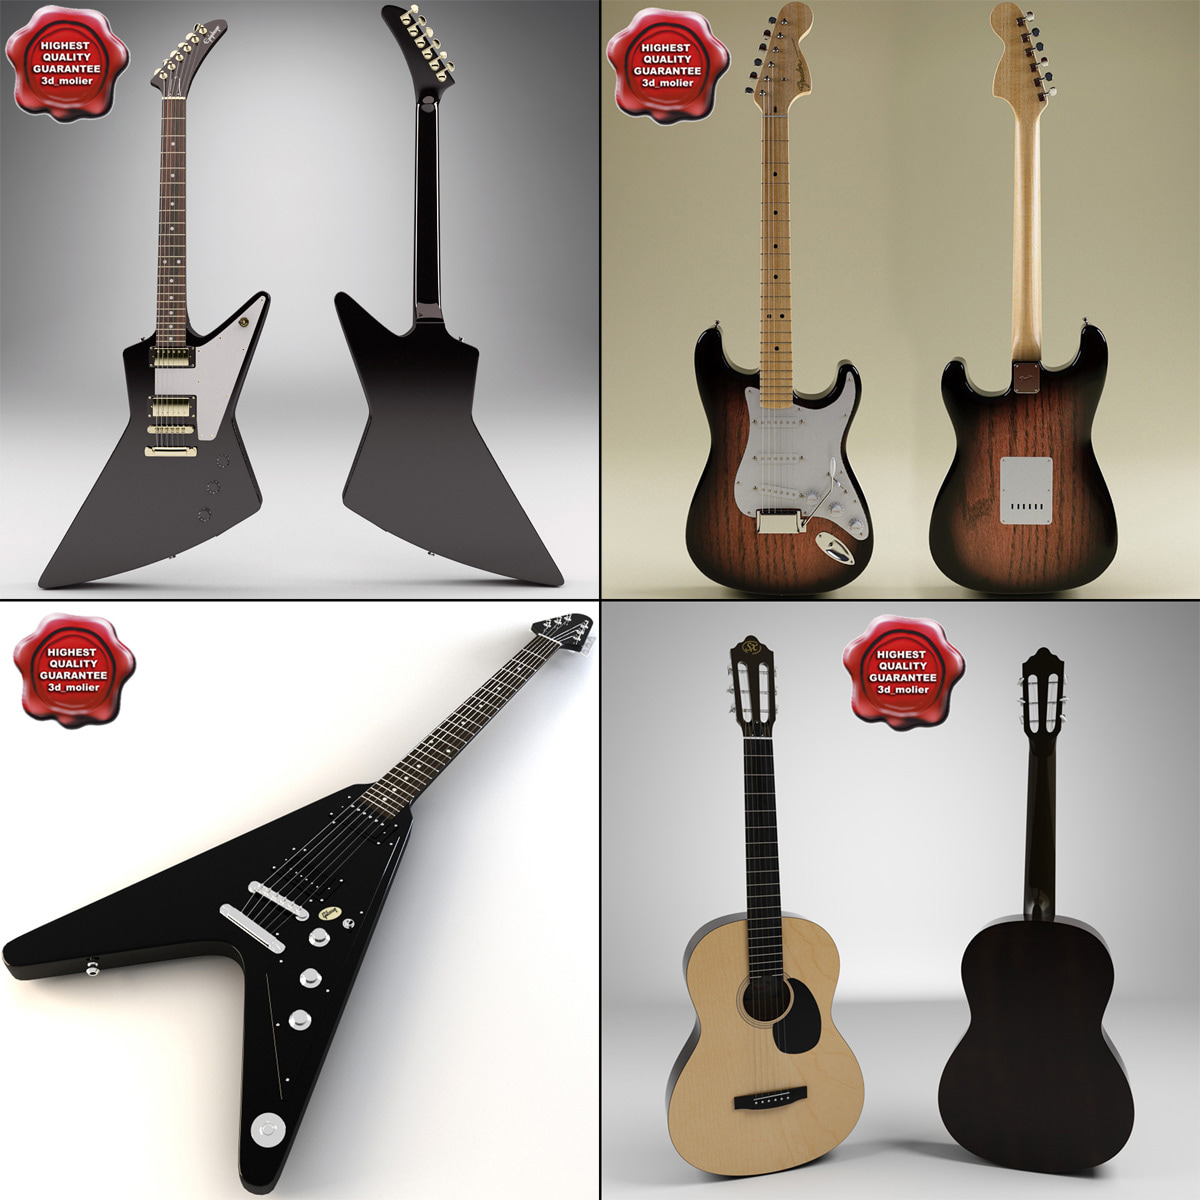 Guitars_Collection_V2_00.jpg